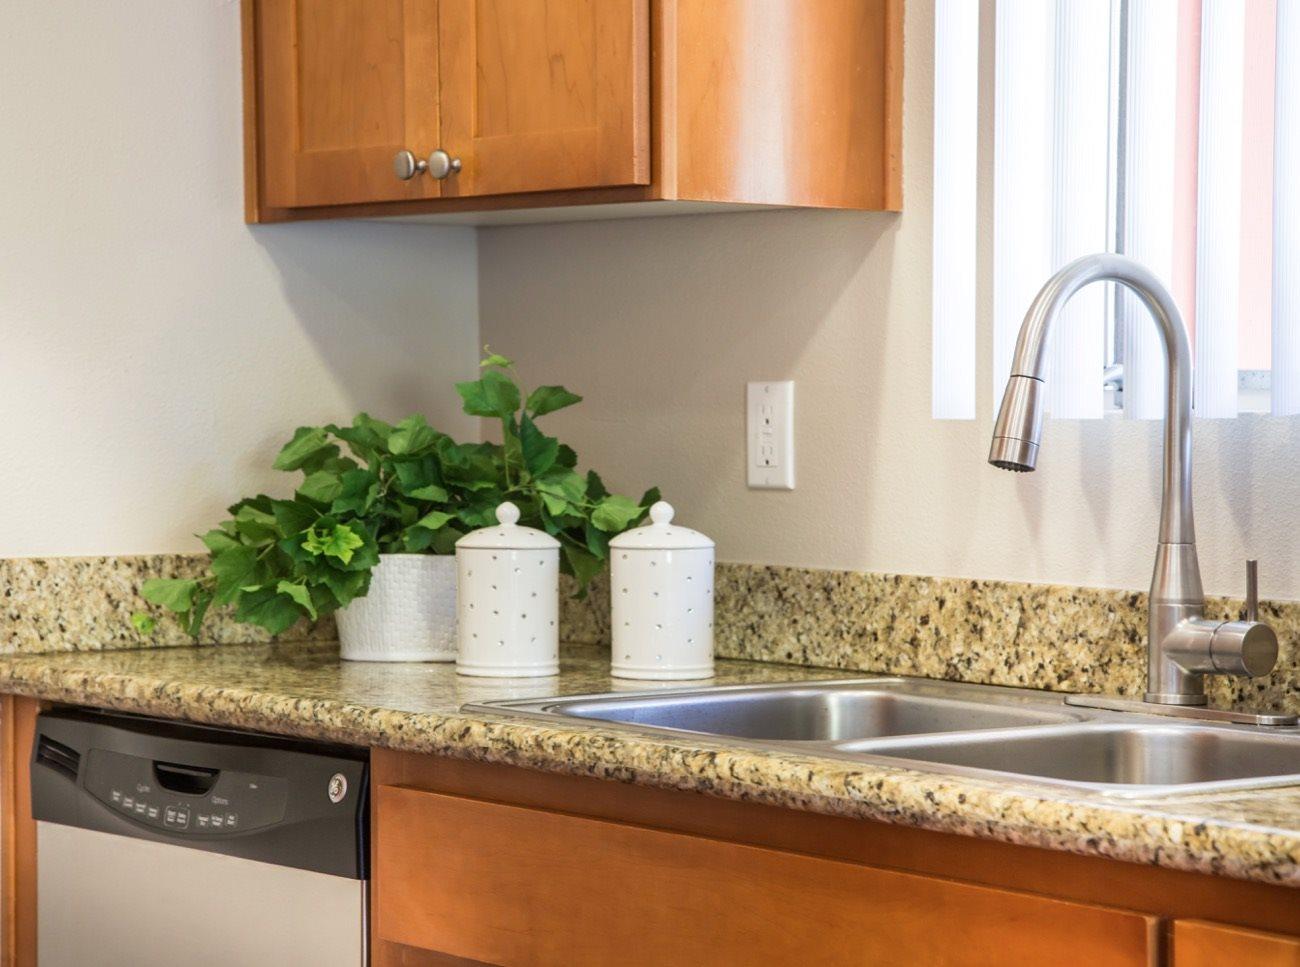 bay-tree-los-gatos-apartments-kitchen-sink